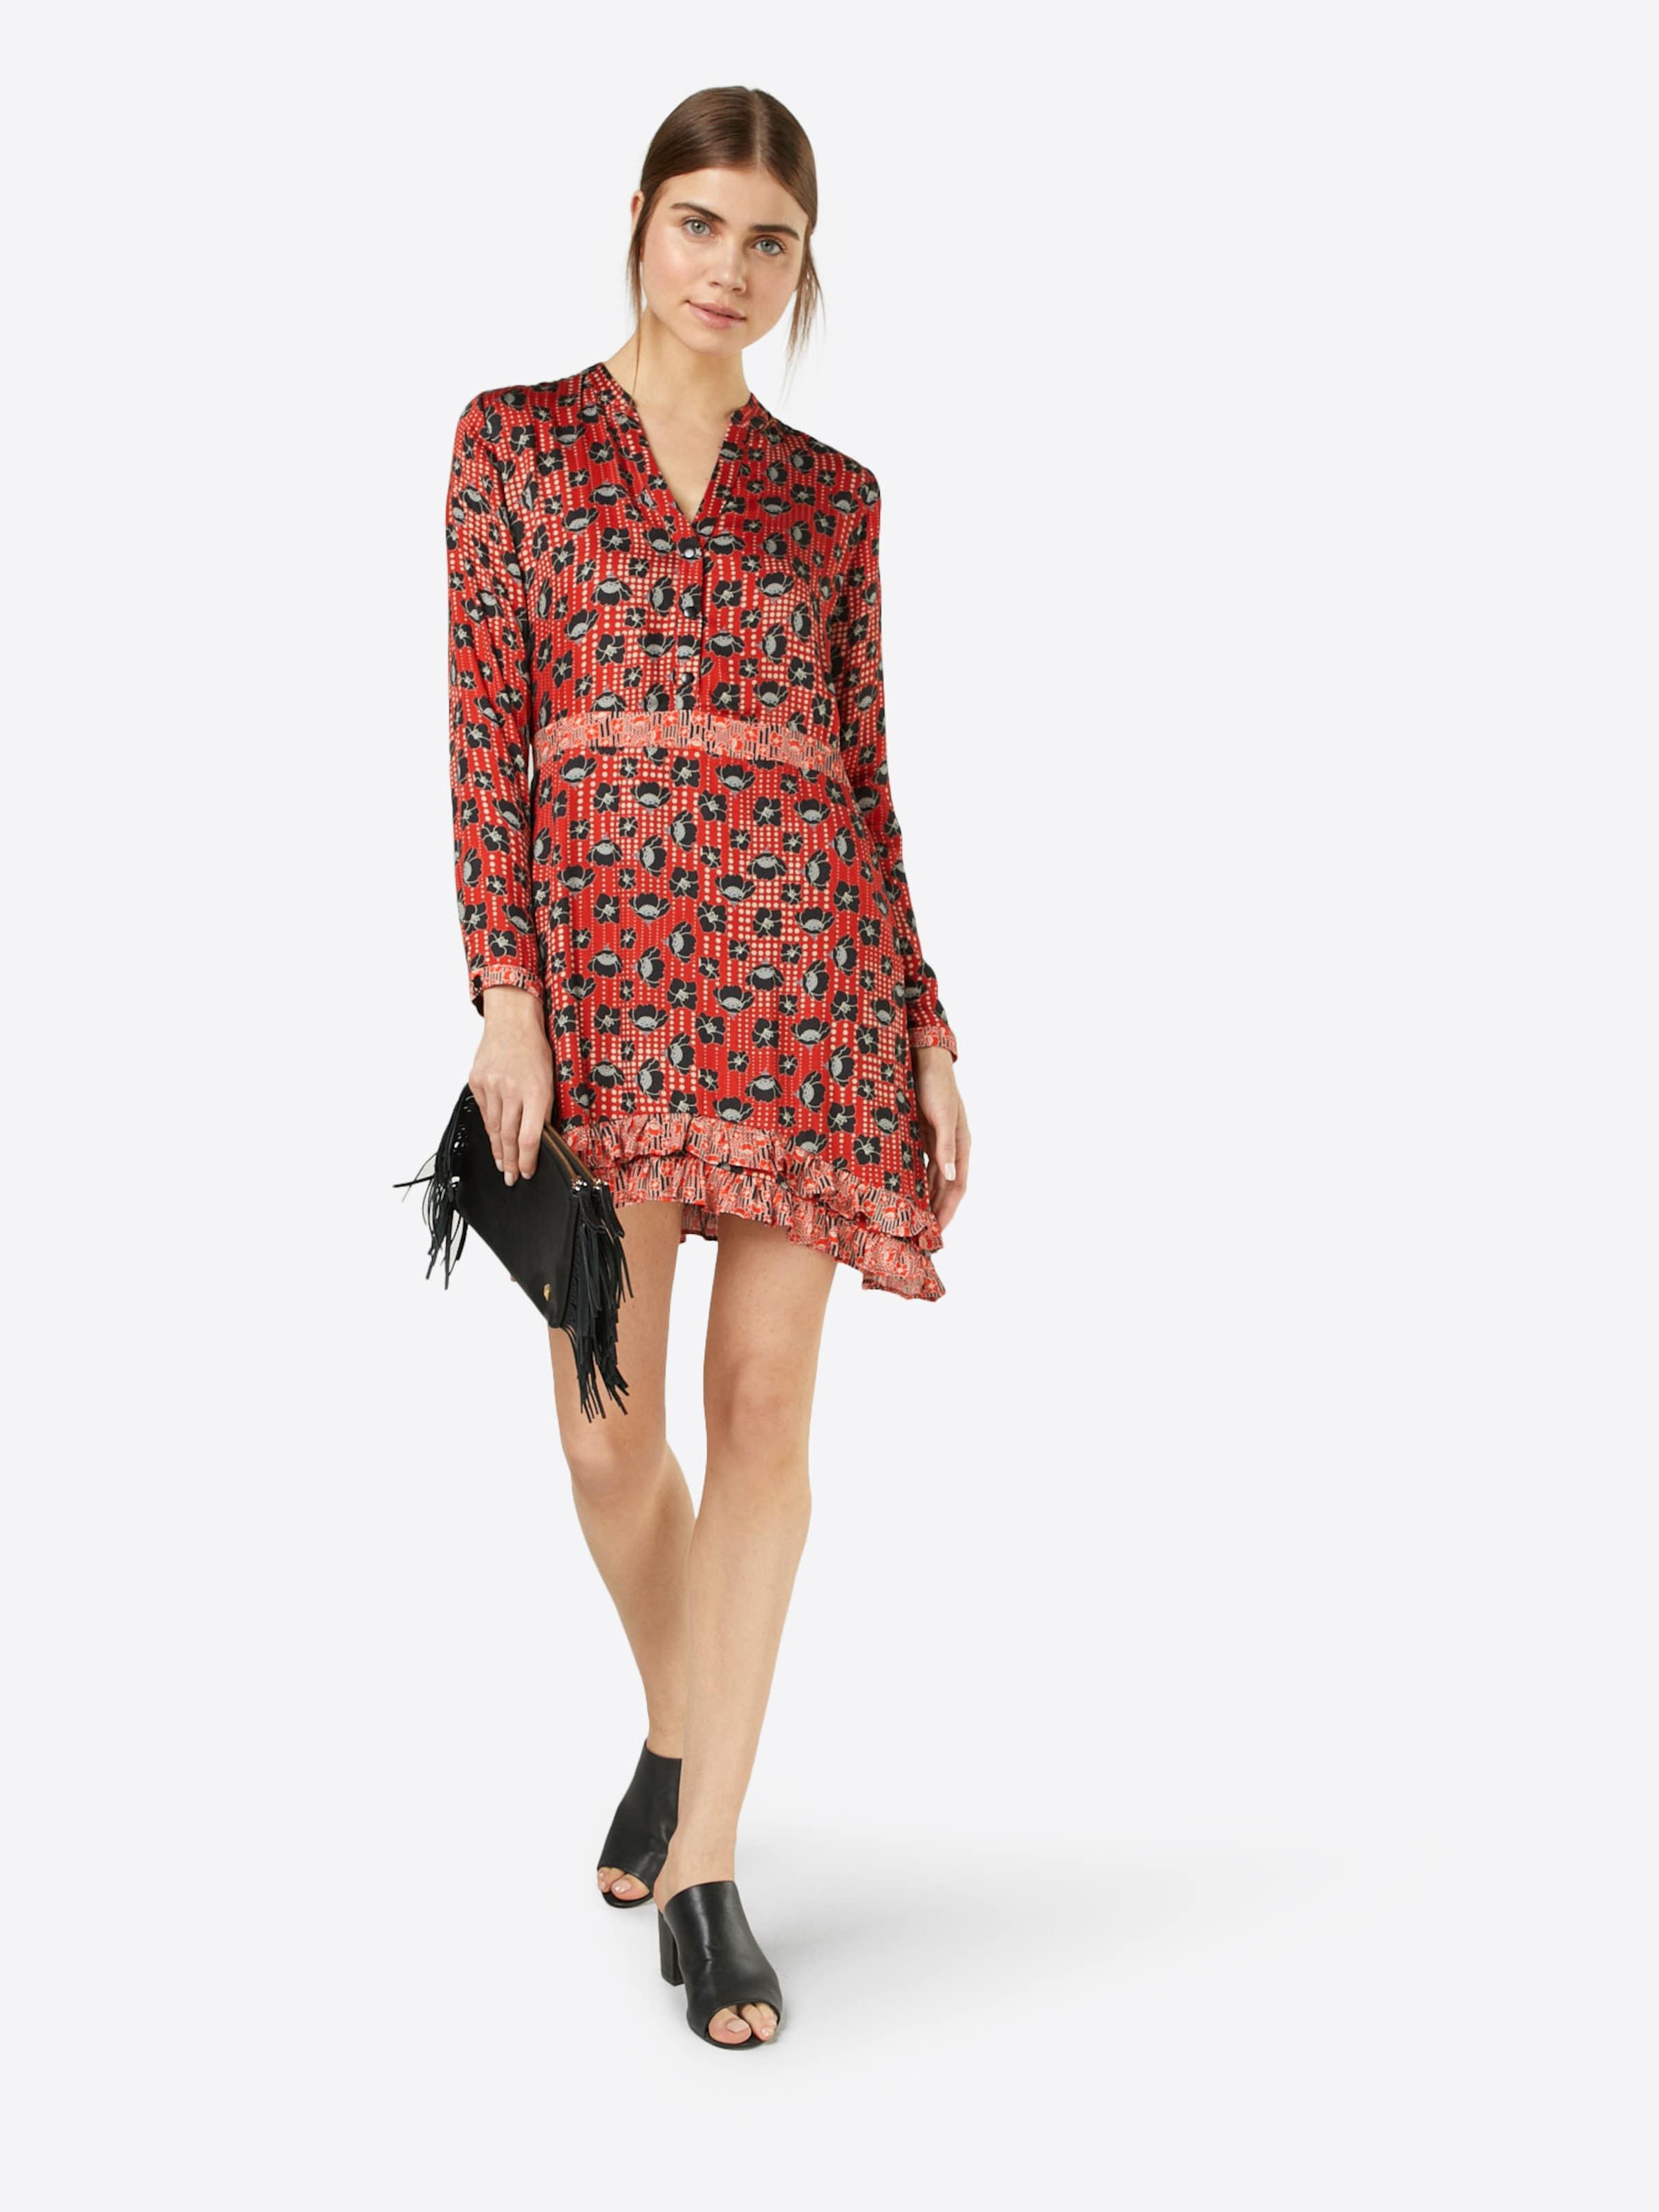 In In Aaiko In Kleid Kleid RotSchwarz RotSchwarz Aaiko Aaiko Aaiko RotSchwarz Kleid vyNOPm80nw